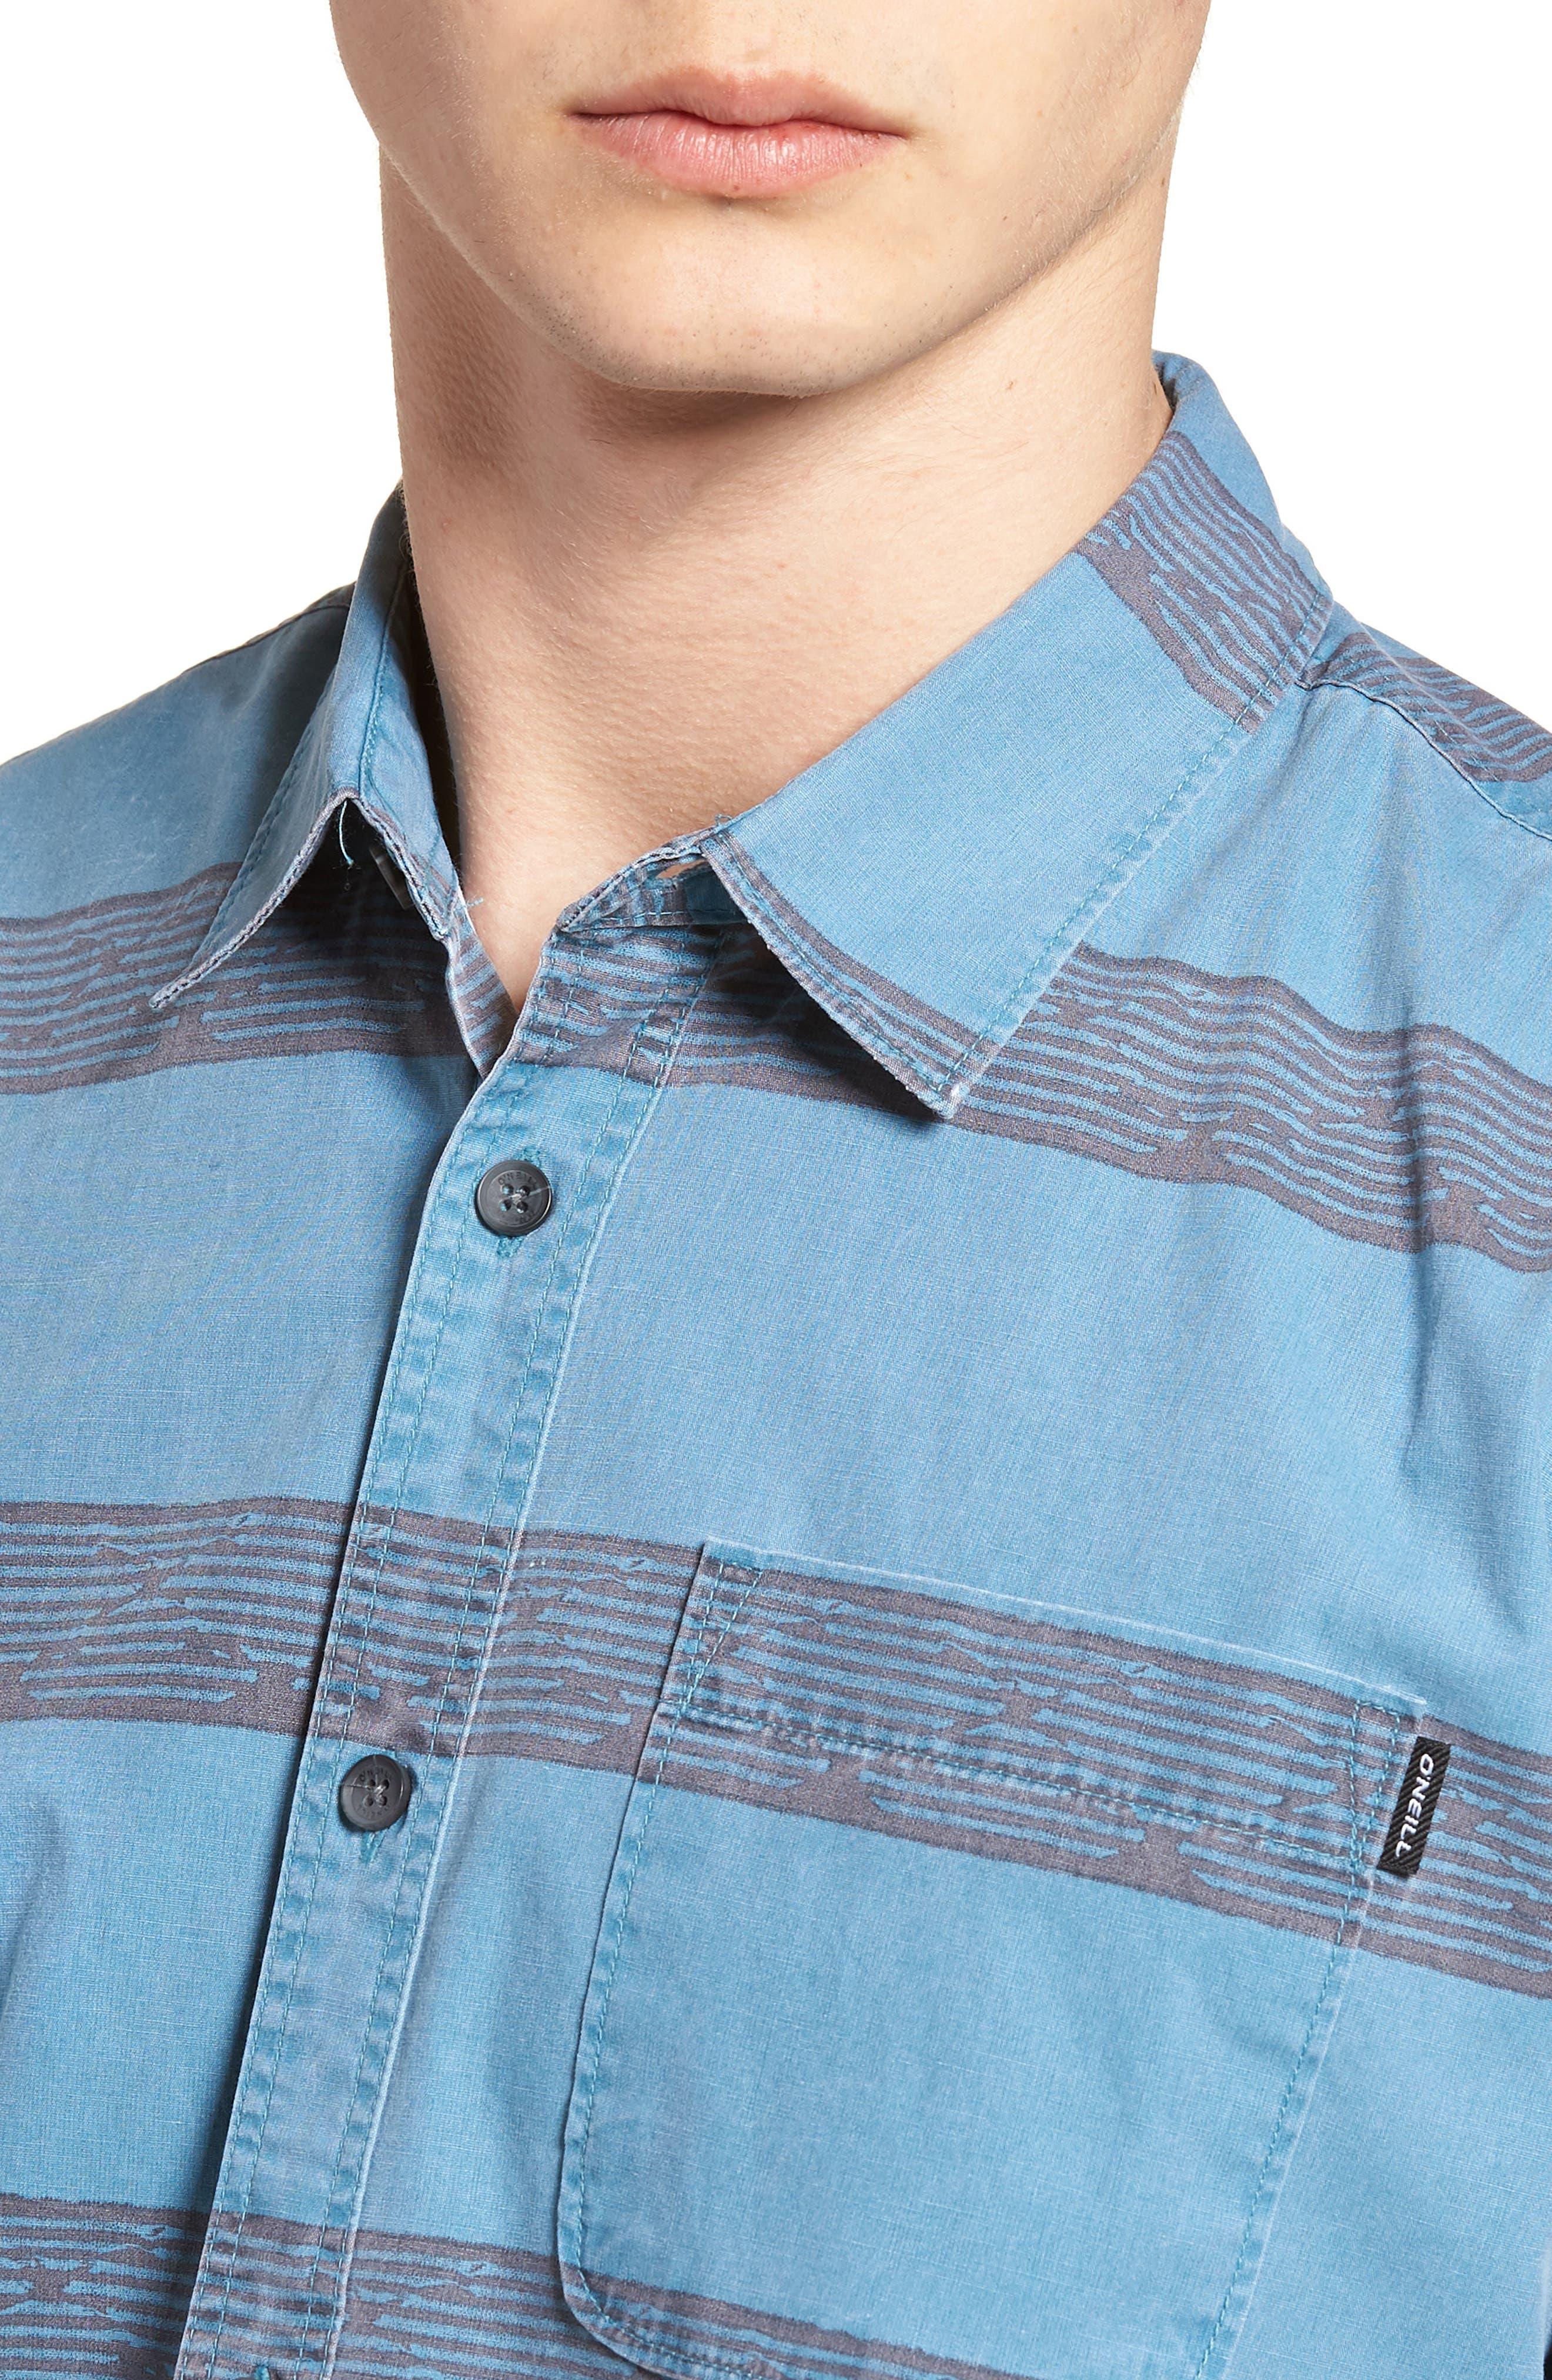 Wagner Woven Shirt,                             Alternate thumbnail 4, color,                             DEEP TEAL